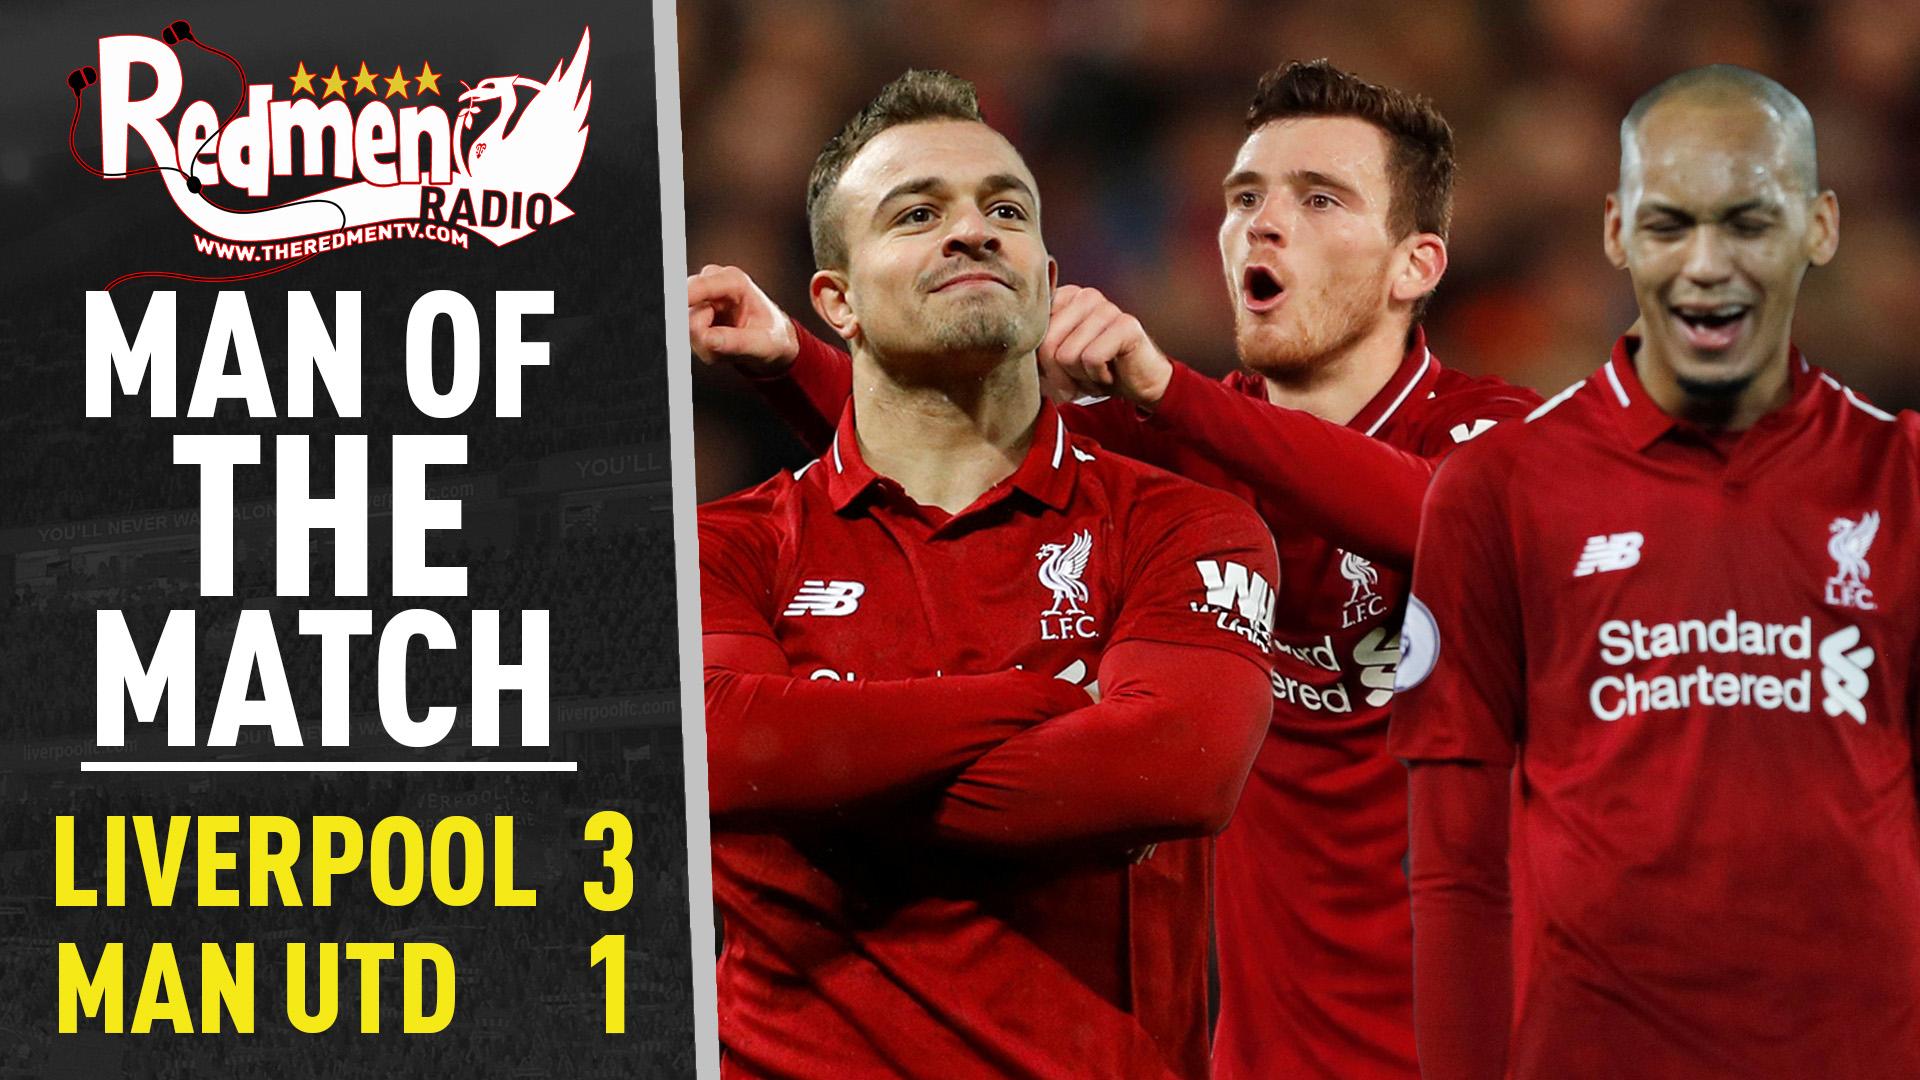 Liverpool 3-1 Man Utd | Man of the Match Podcast - The Redmen TV